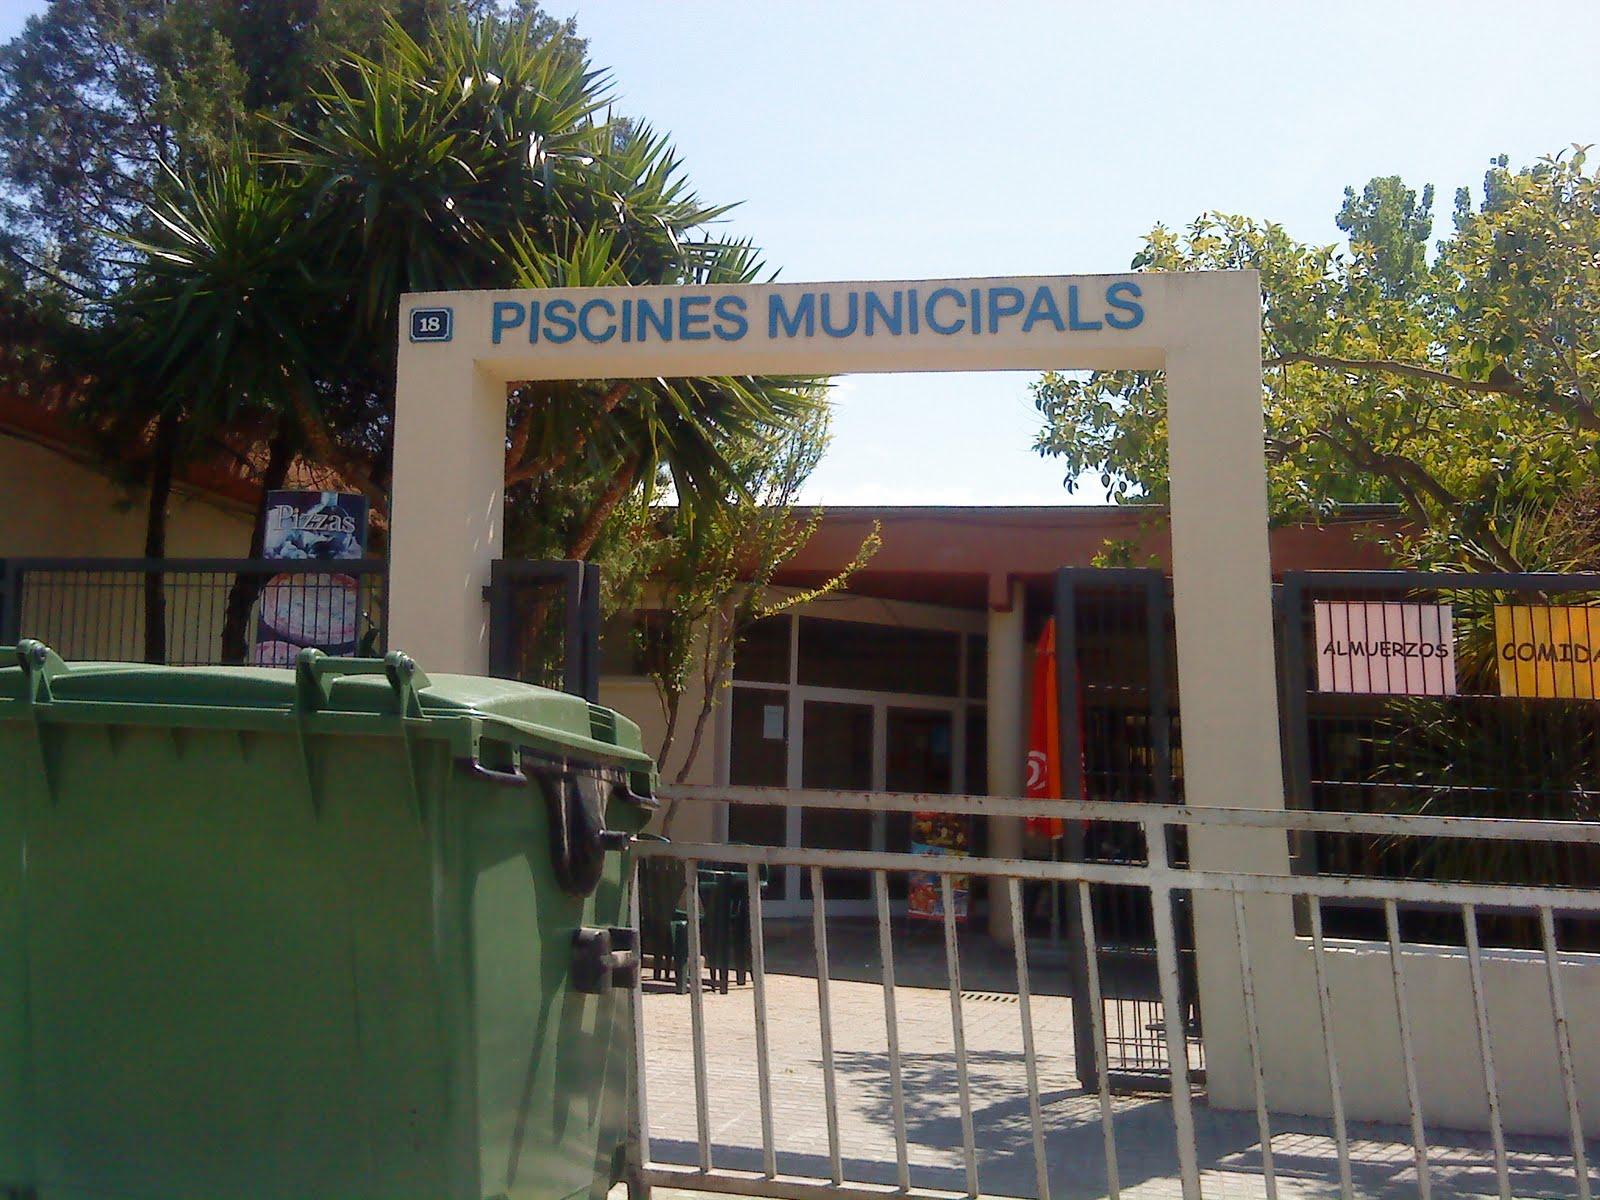 El meu poble abrera for Piscina municipal martorell